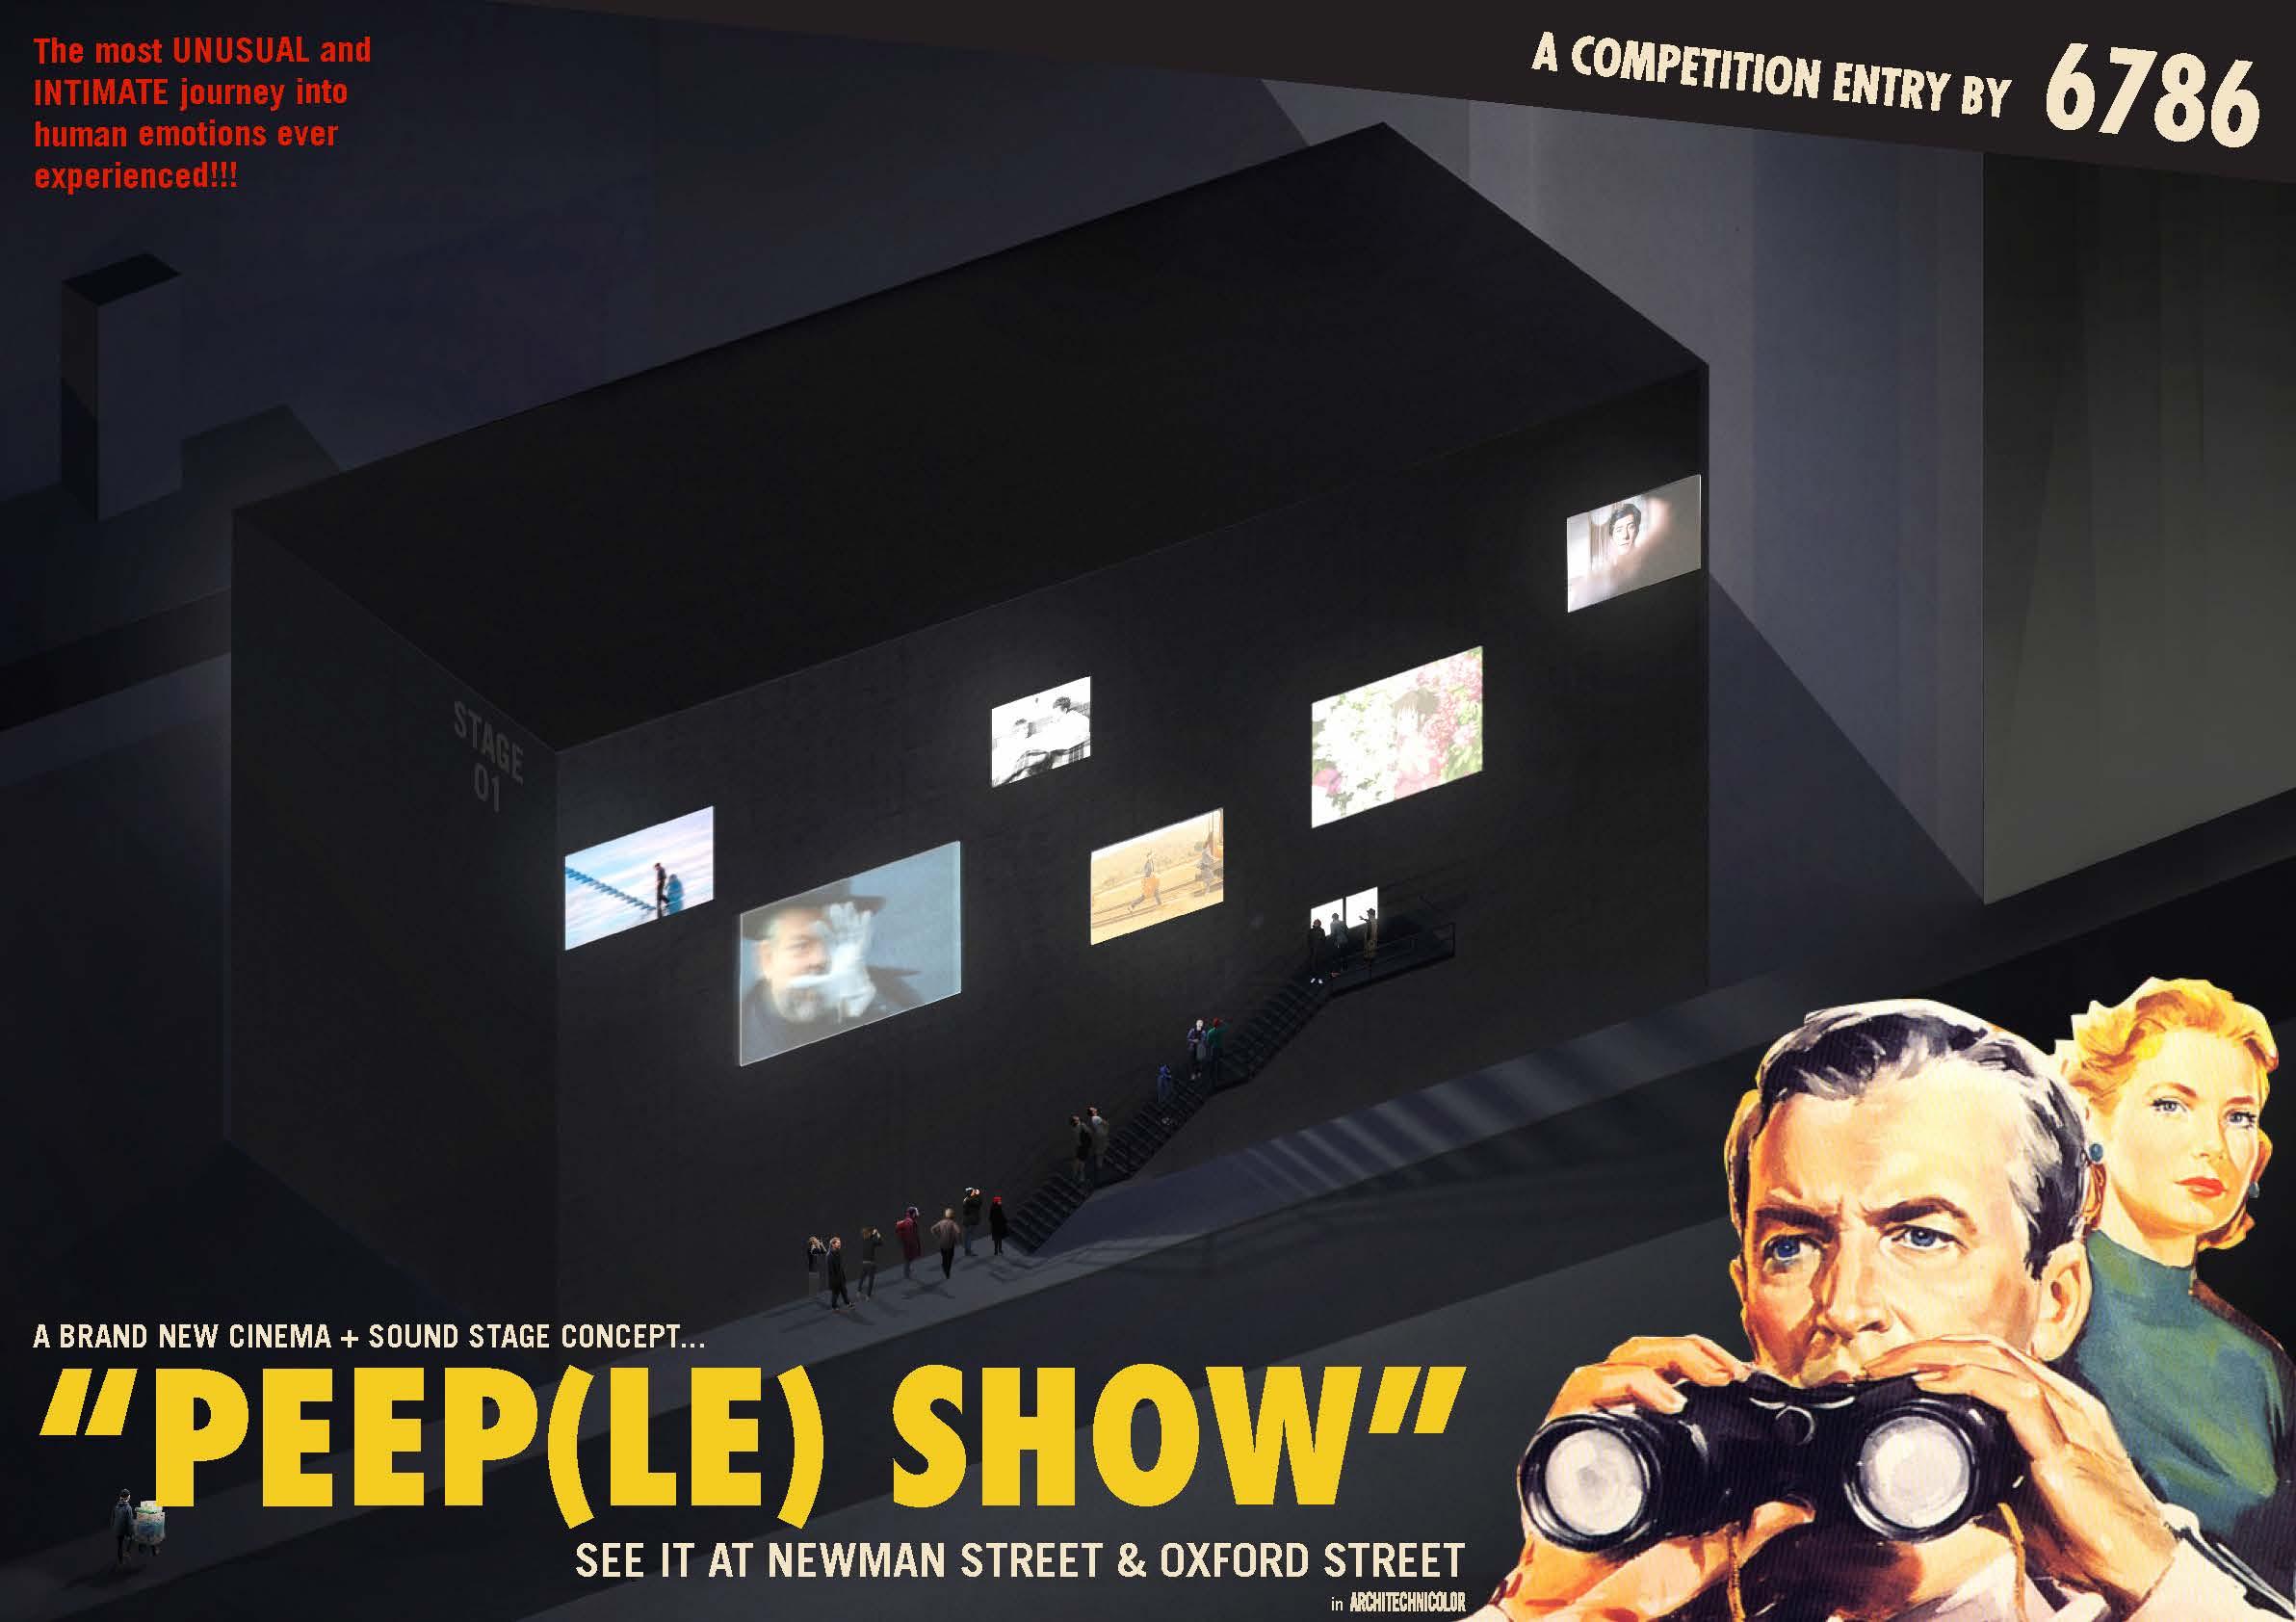 Peeple-show-large-1